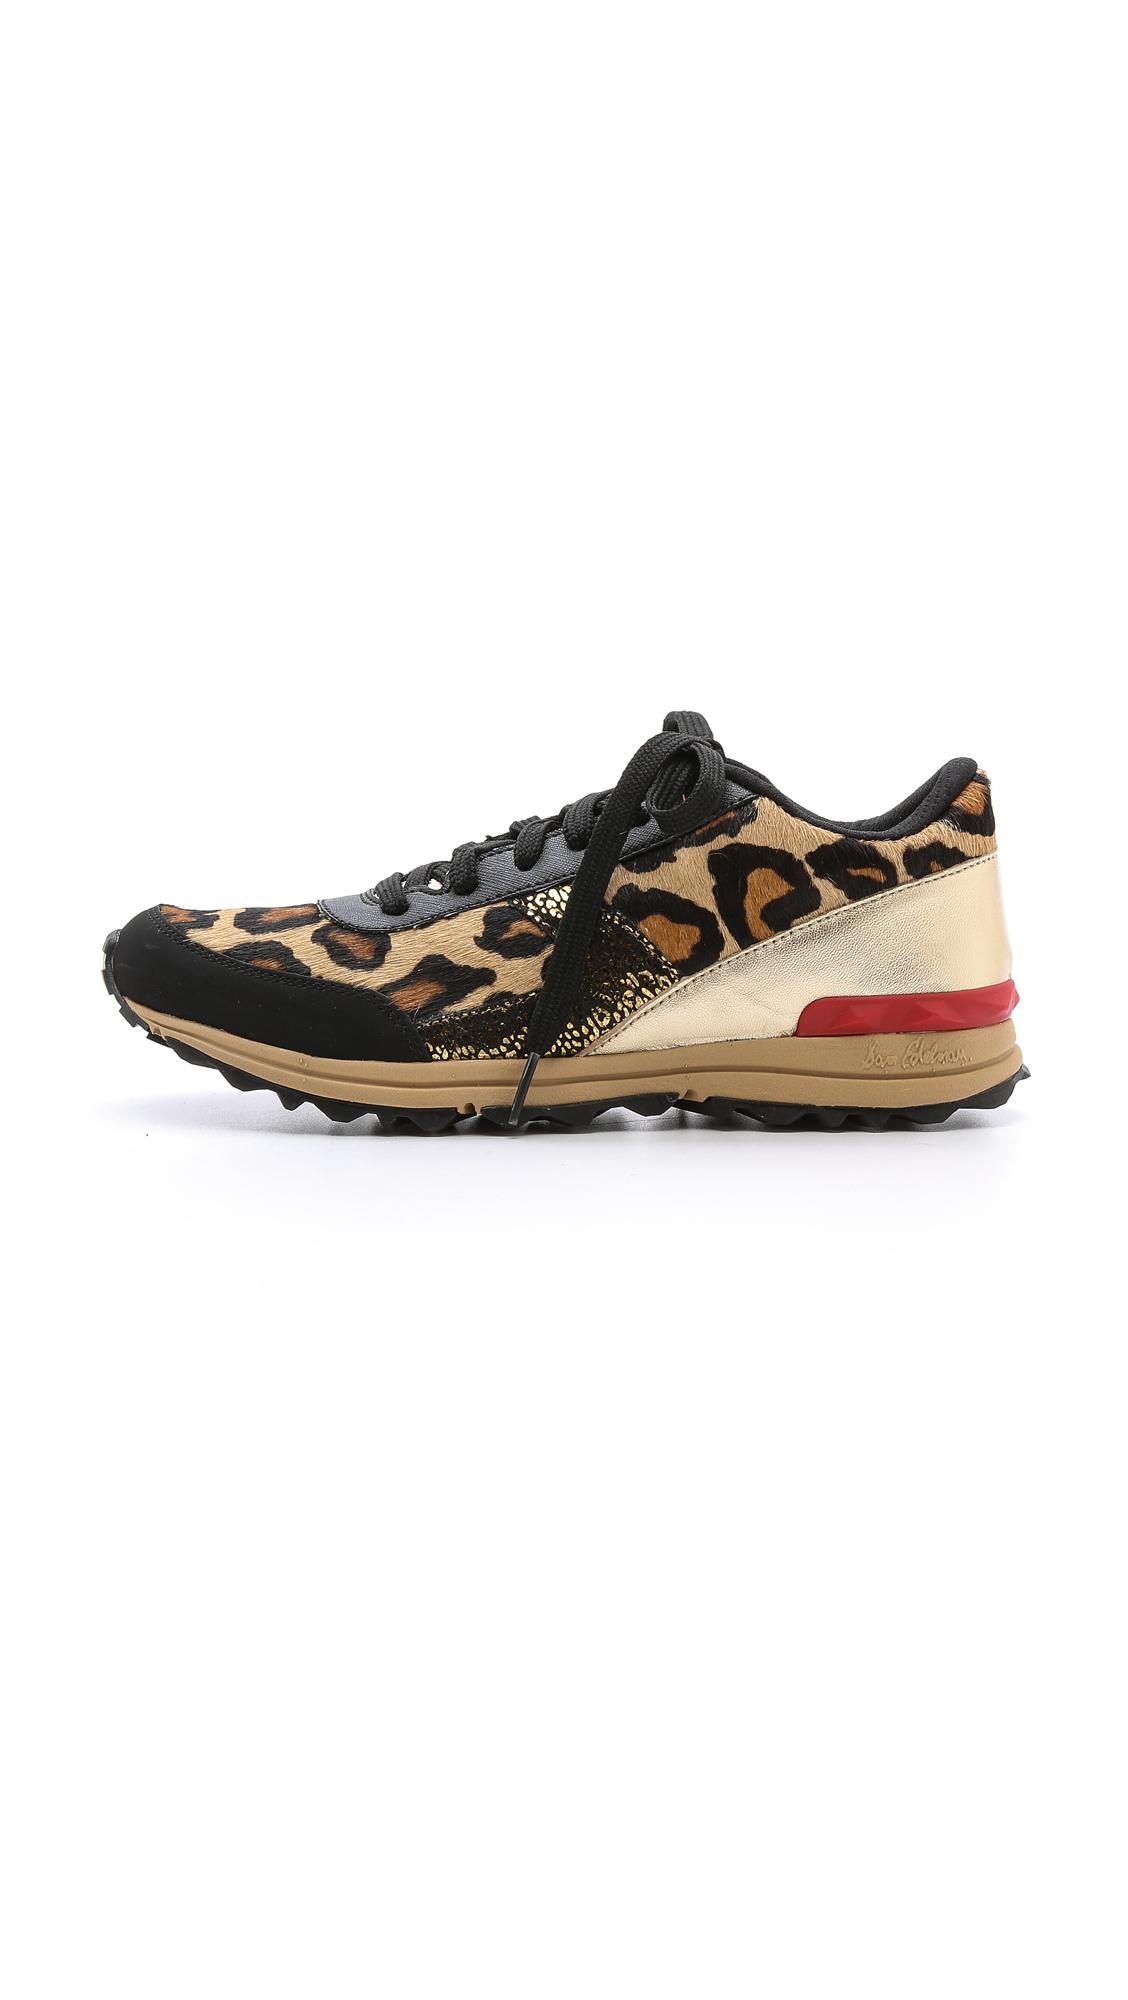 ab25de3151029c Sam Edelman Dax Jogging Sneakers - Black Gold Leopard - Lyst